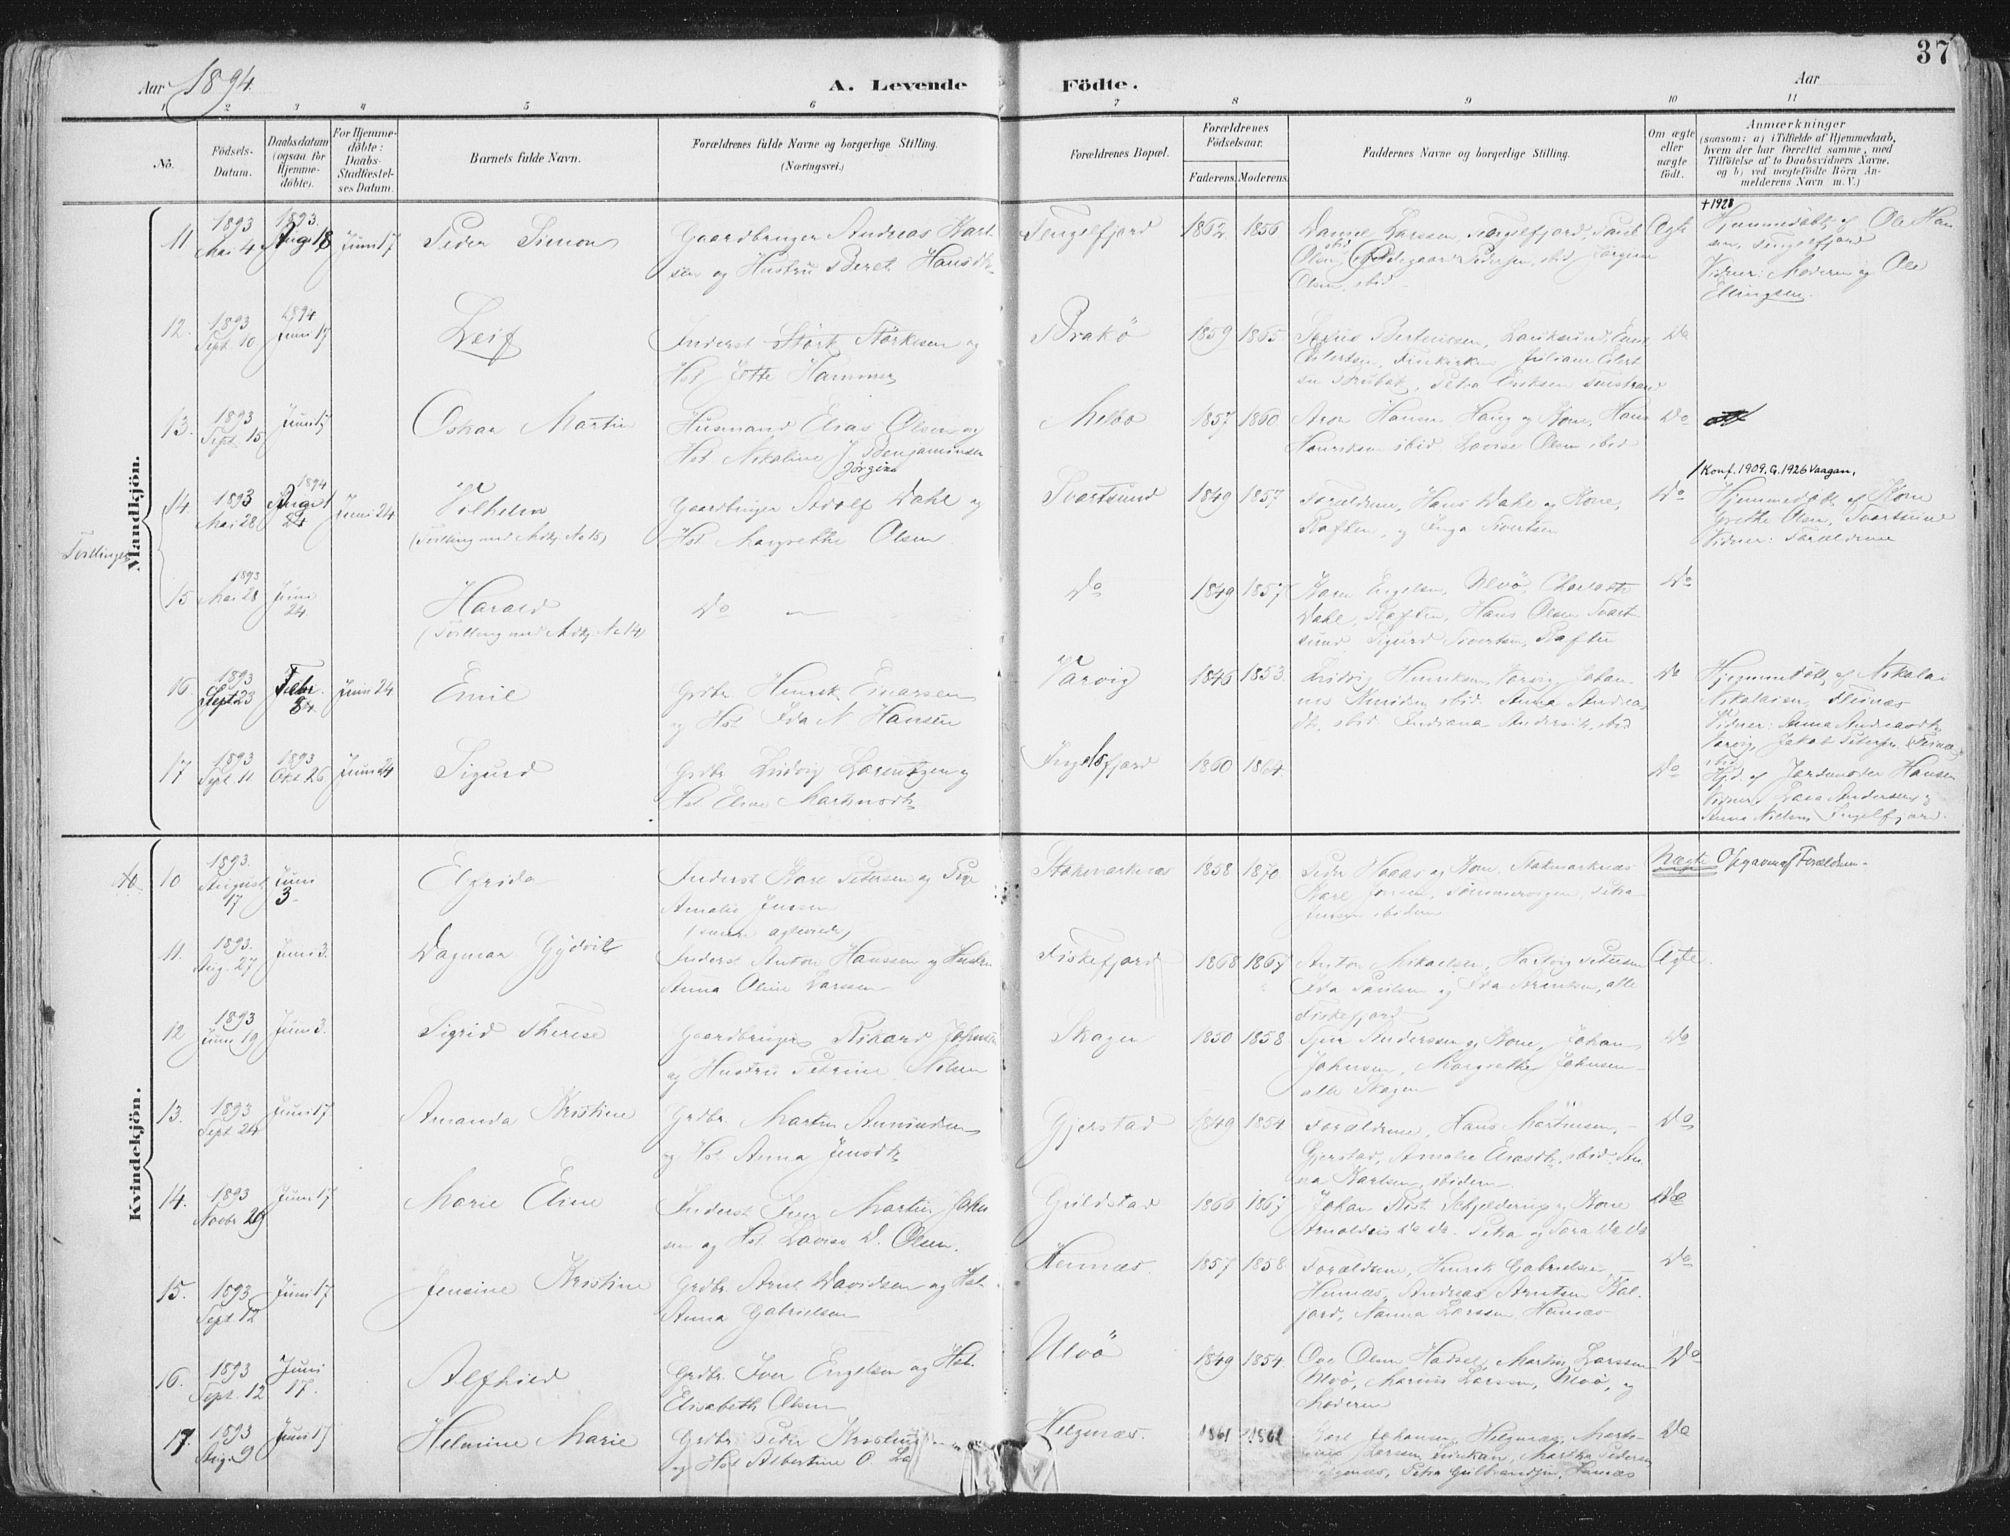 SAT, Ministerialprotokoller, klokkerbøker og fødselsregistre - Nordland, 888/L1246: Ministerialbok nr. 888A12, 1891-1903, s. 37